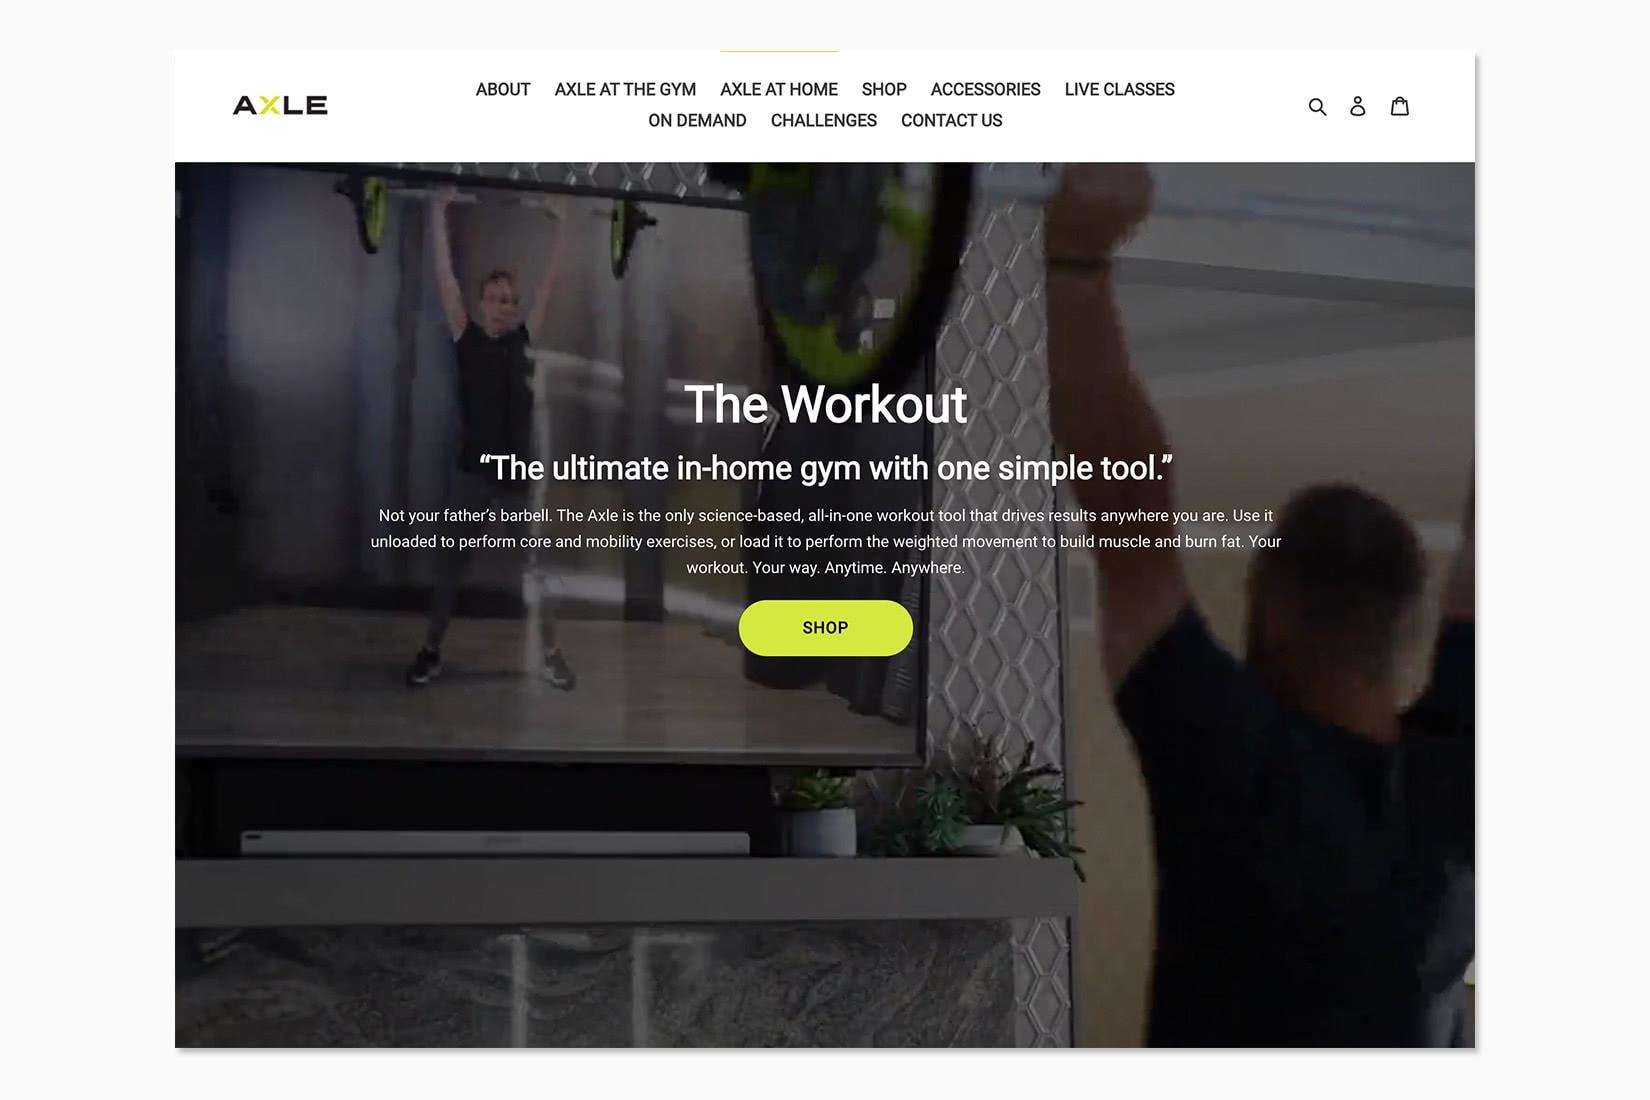 best online workout program theaxleworkout review - Luxe Digital